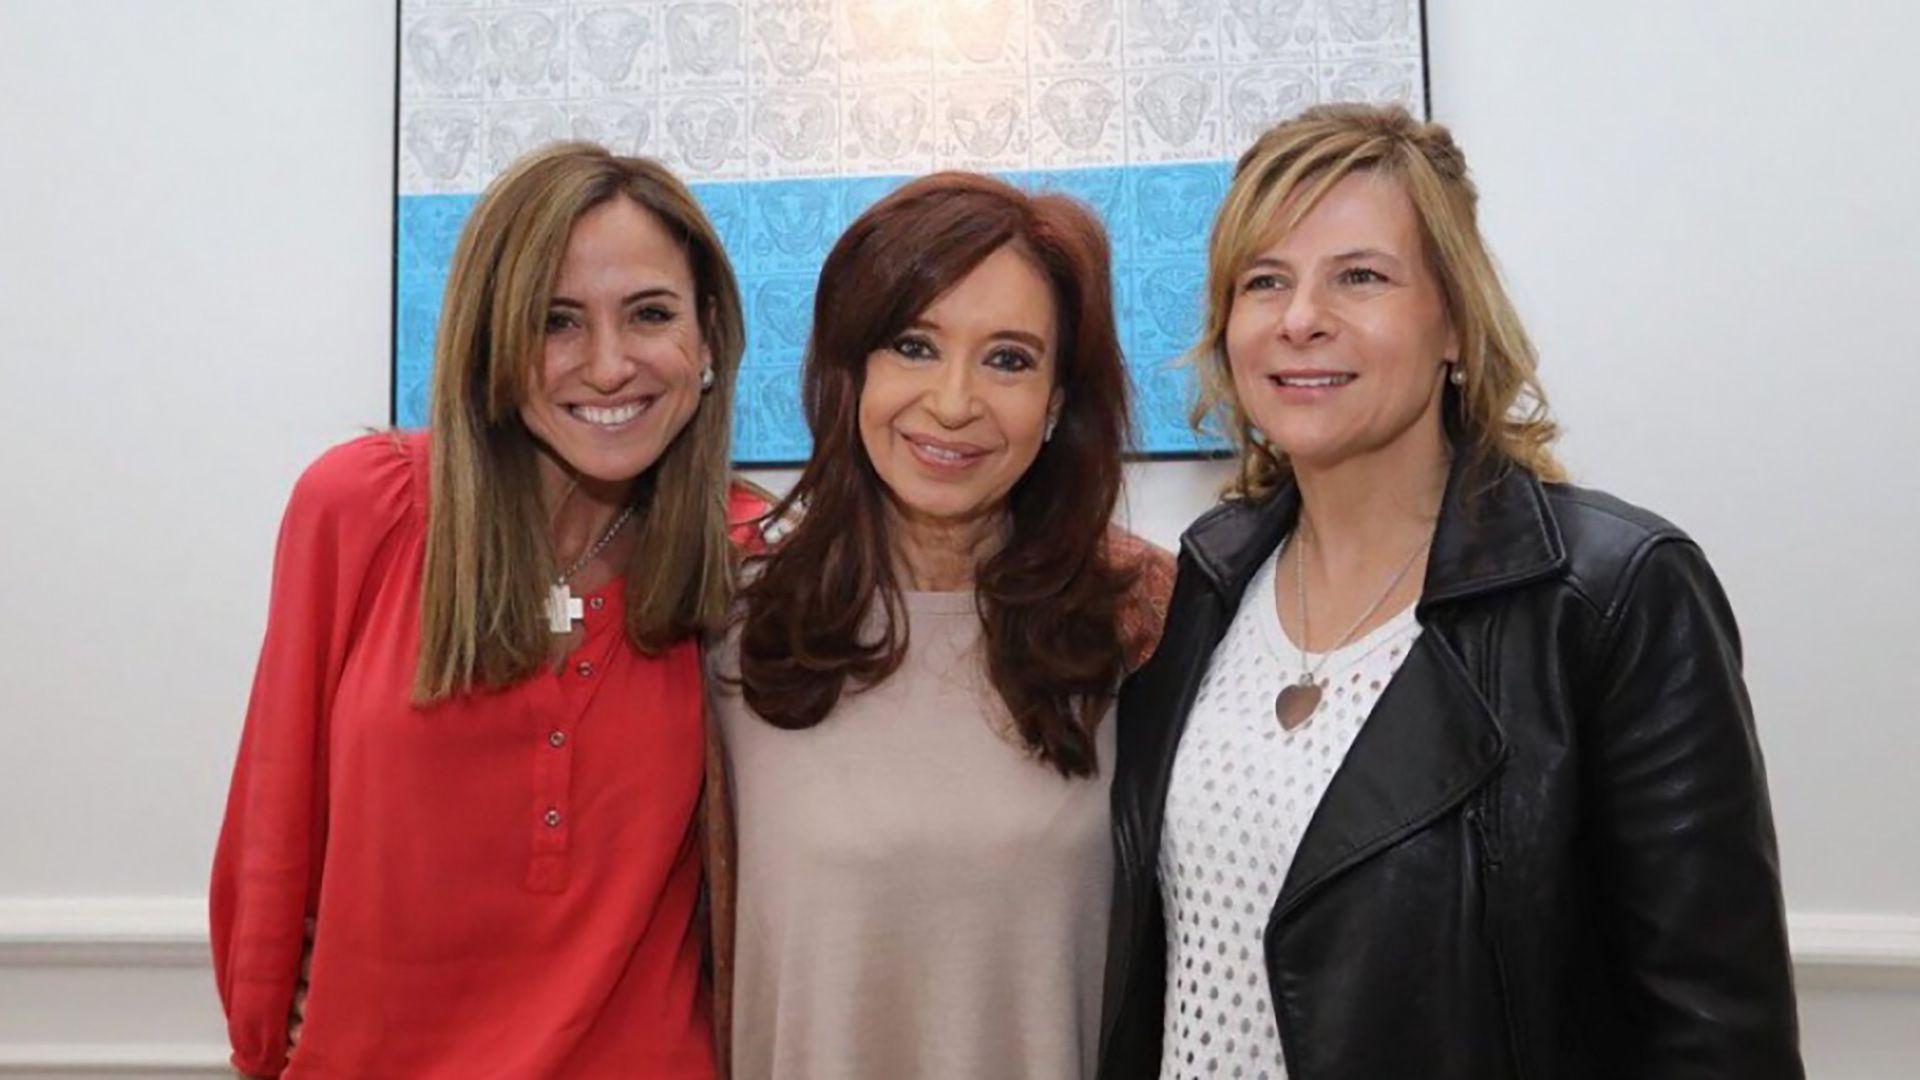 Cristina Kirchner junto a Florencia Saintout (derecha) y Victoria Tolosa Paz (izquierda)